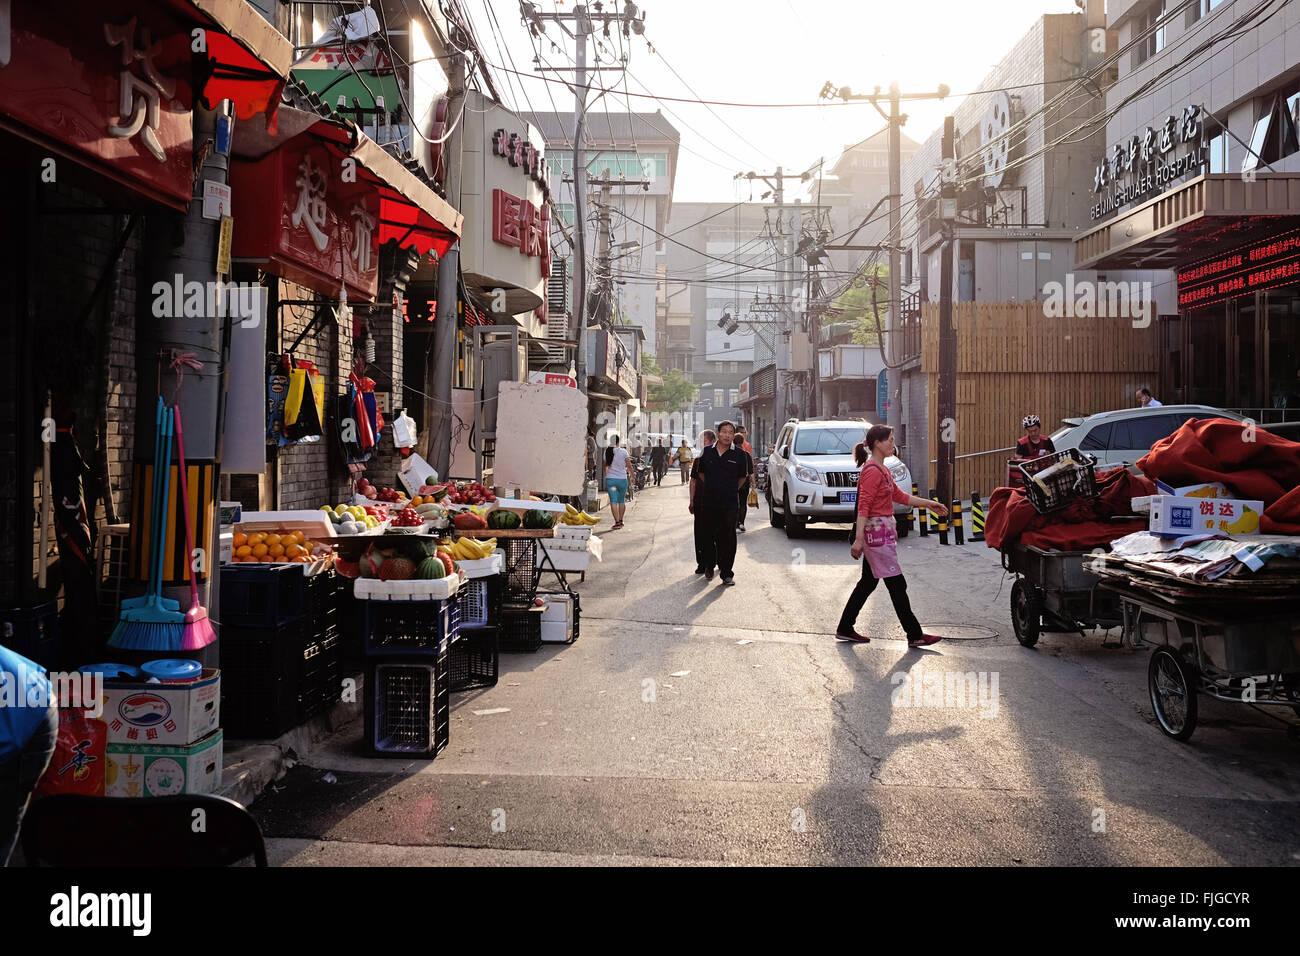 Peking-Straßenszene Stockfoto, Bild: 97477067 - Alamy